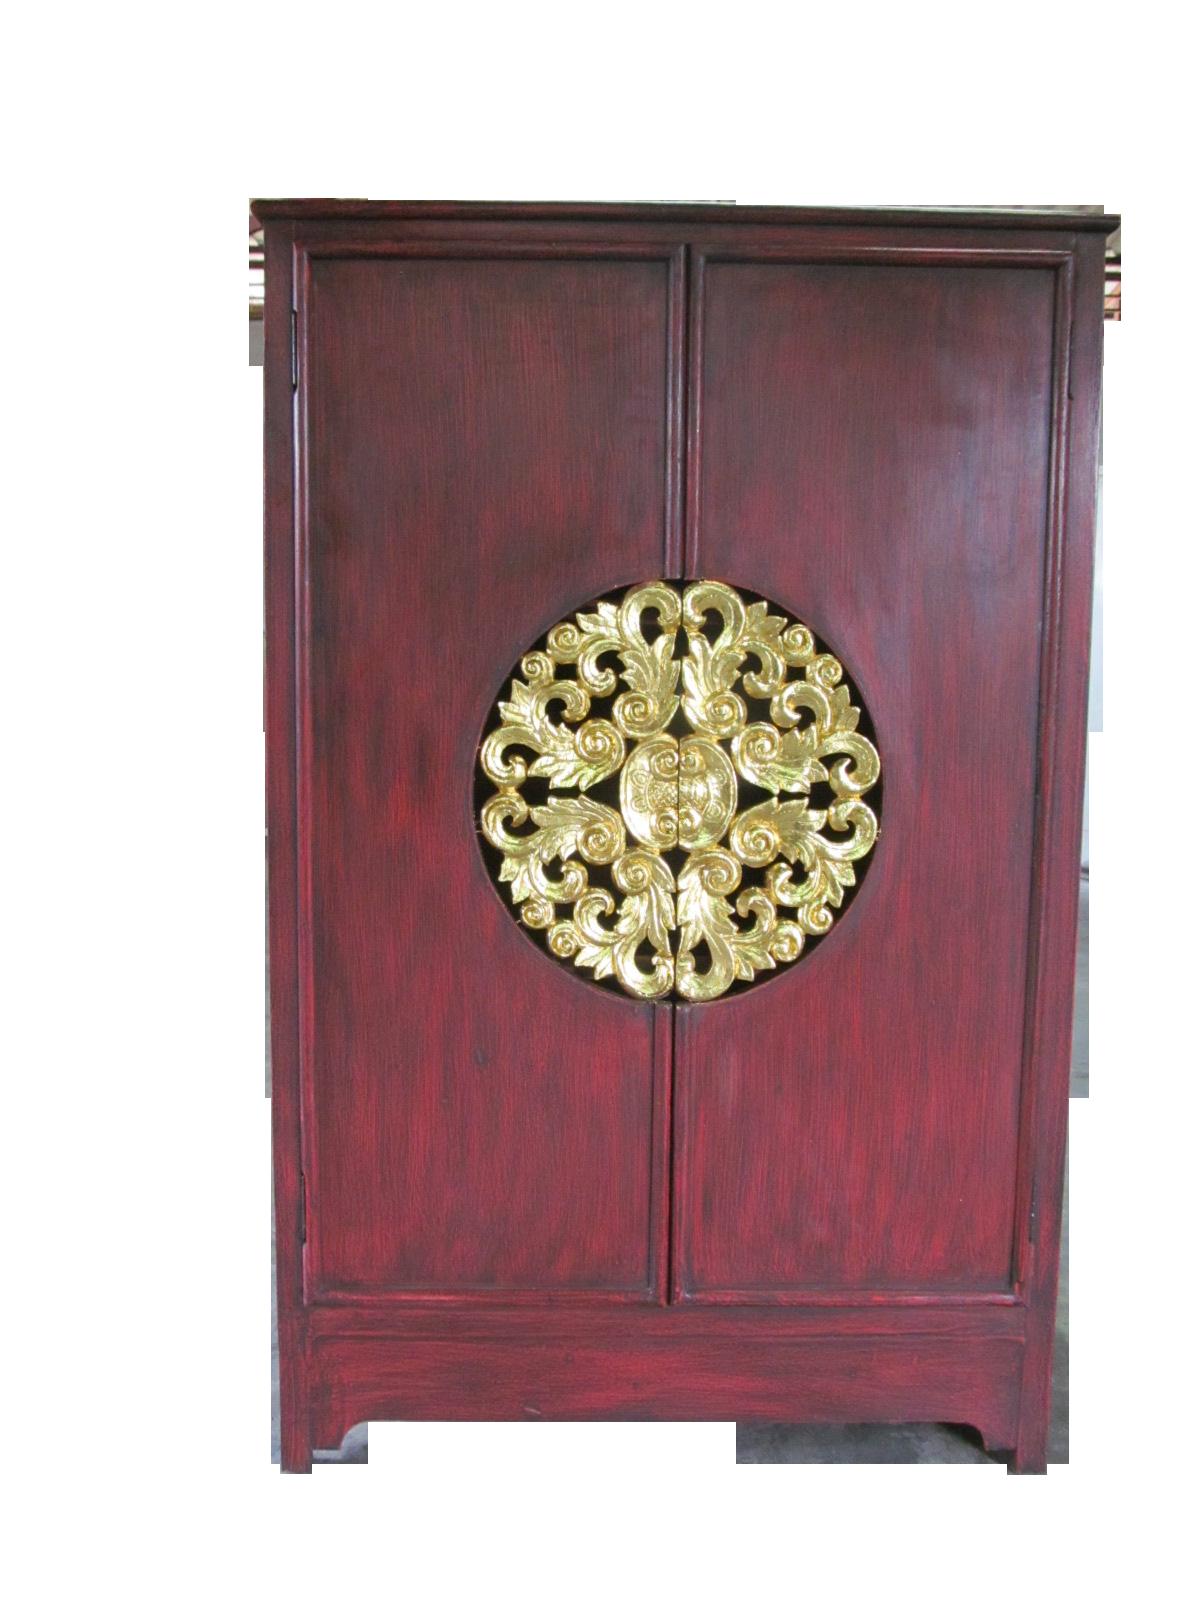 Asiatische möbel  Asiatische Möbel Online kaufen, Buddha Figuren